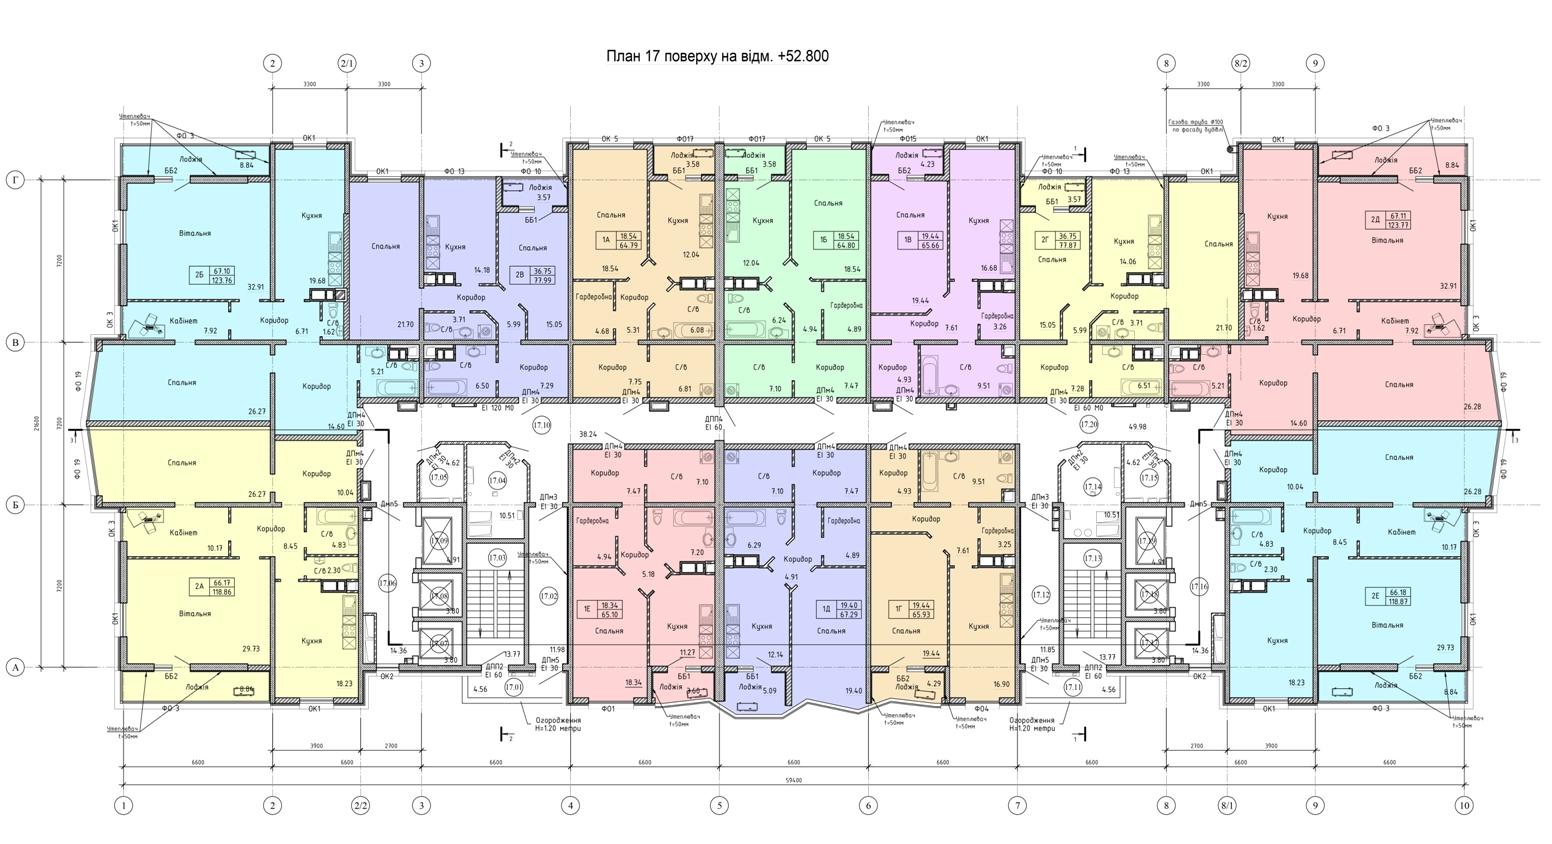 Олимпийский Комплекс апартаментов план 17 этажа